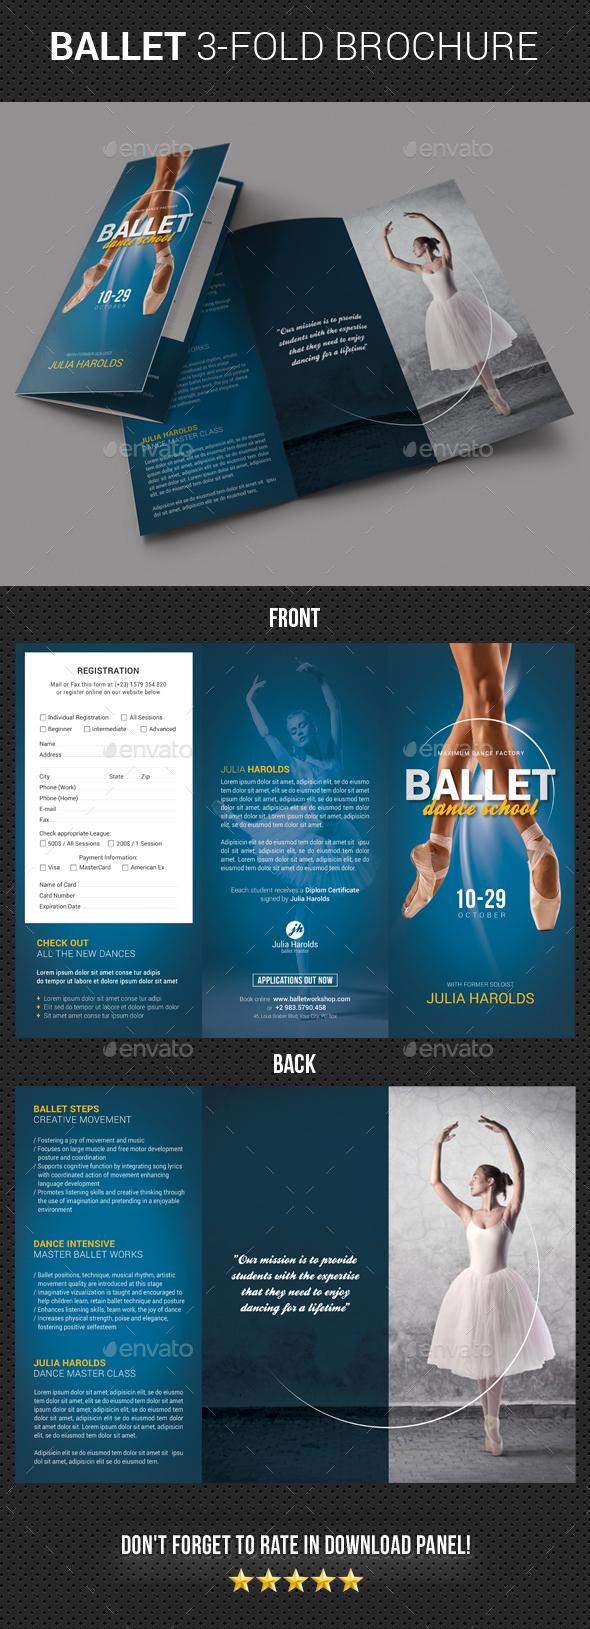 Ballet Workshop 3-Fold Brochure - Brochures Print Templates